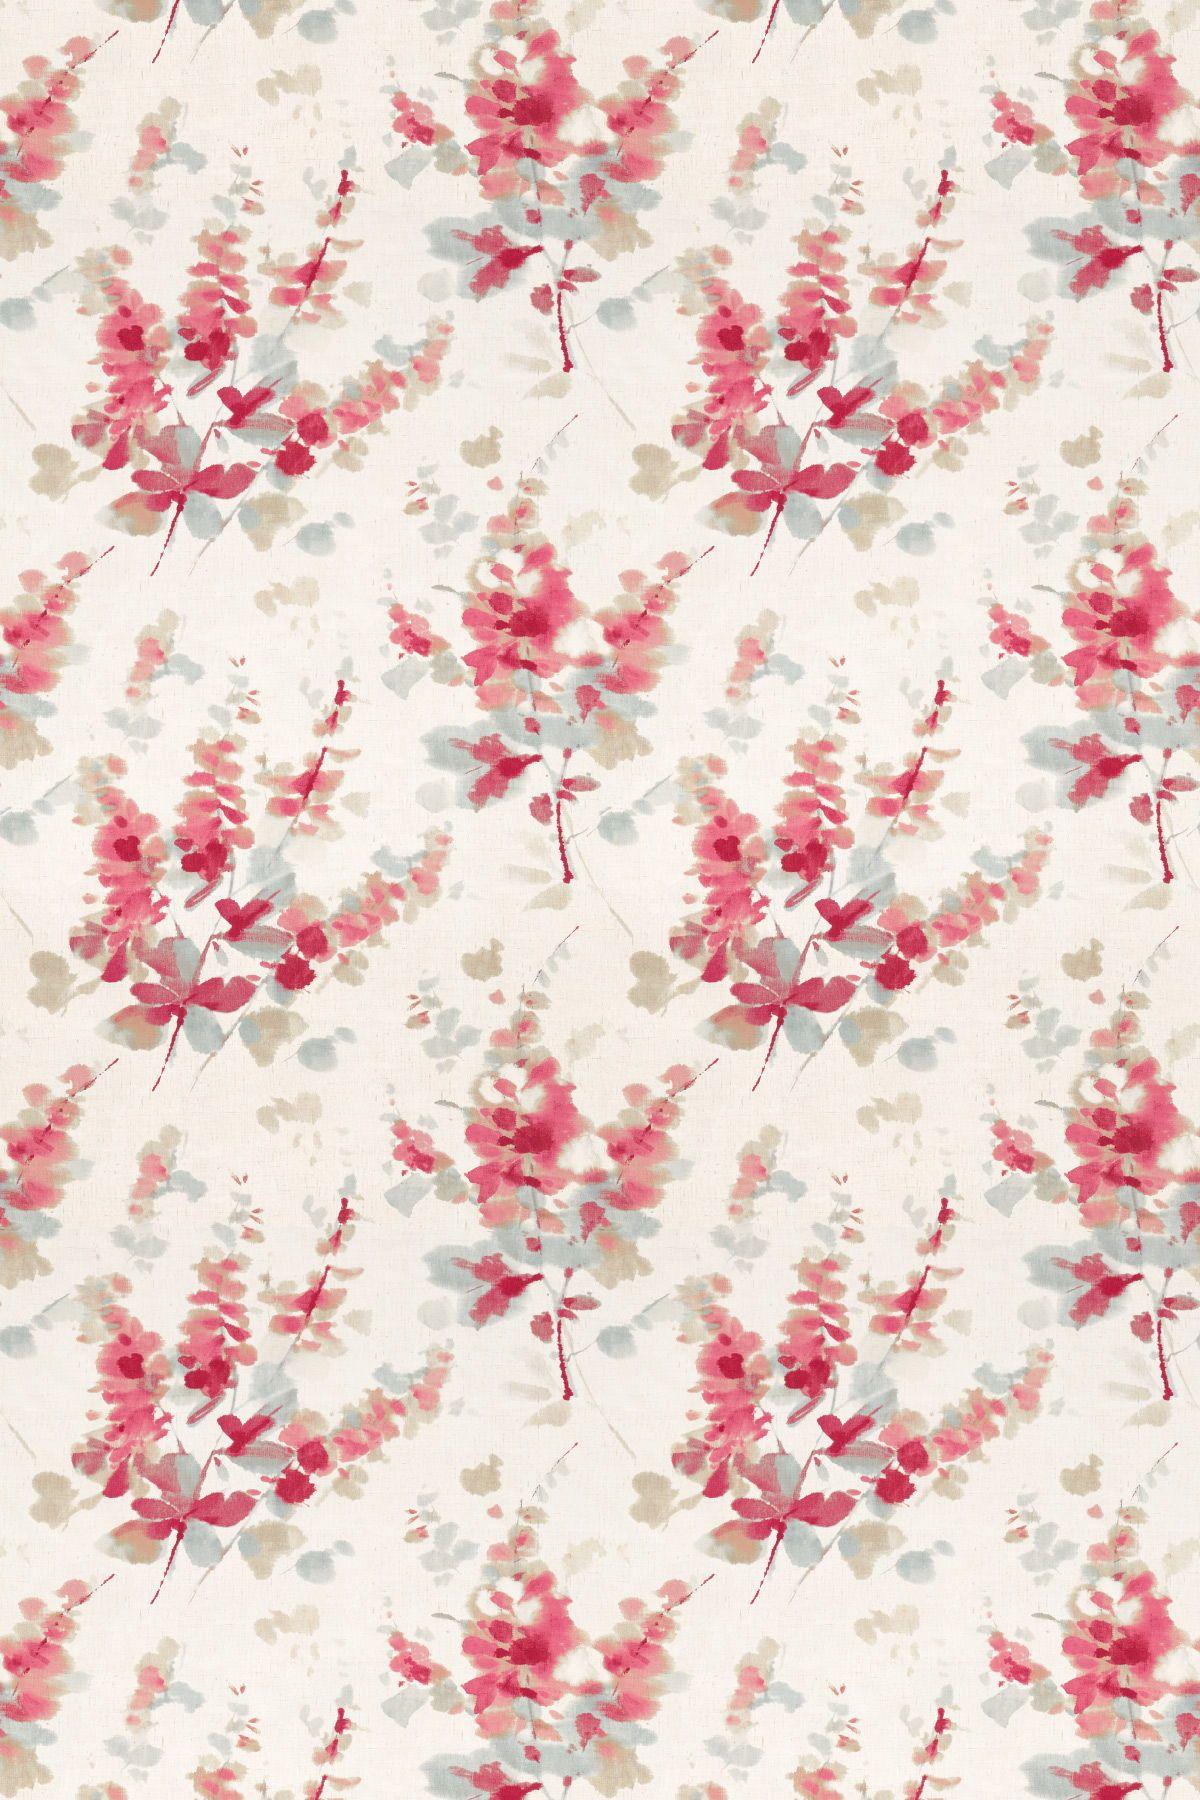 Delphiniums coral by sanderson fabric 226290